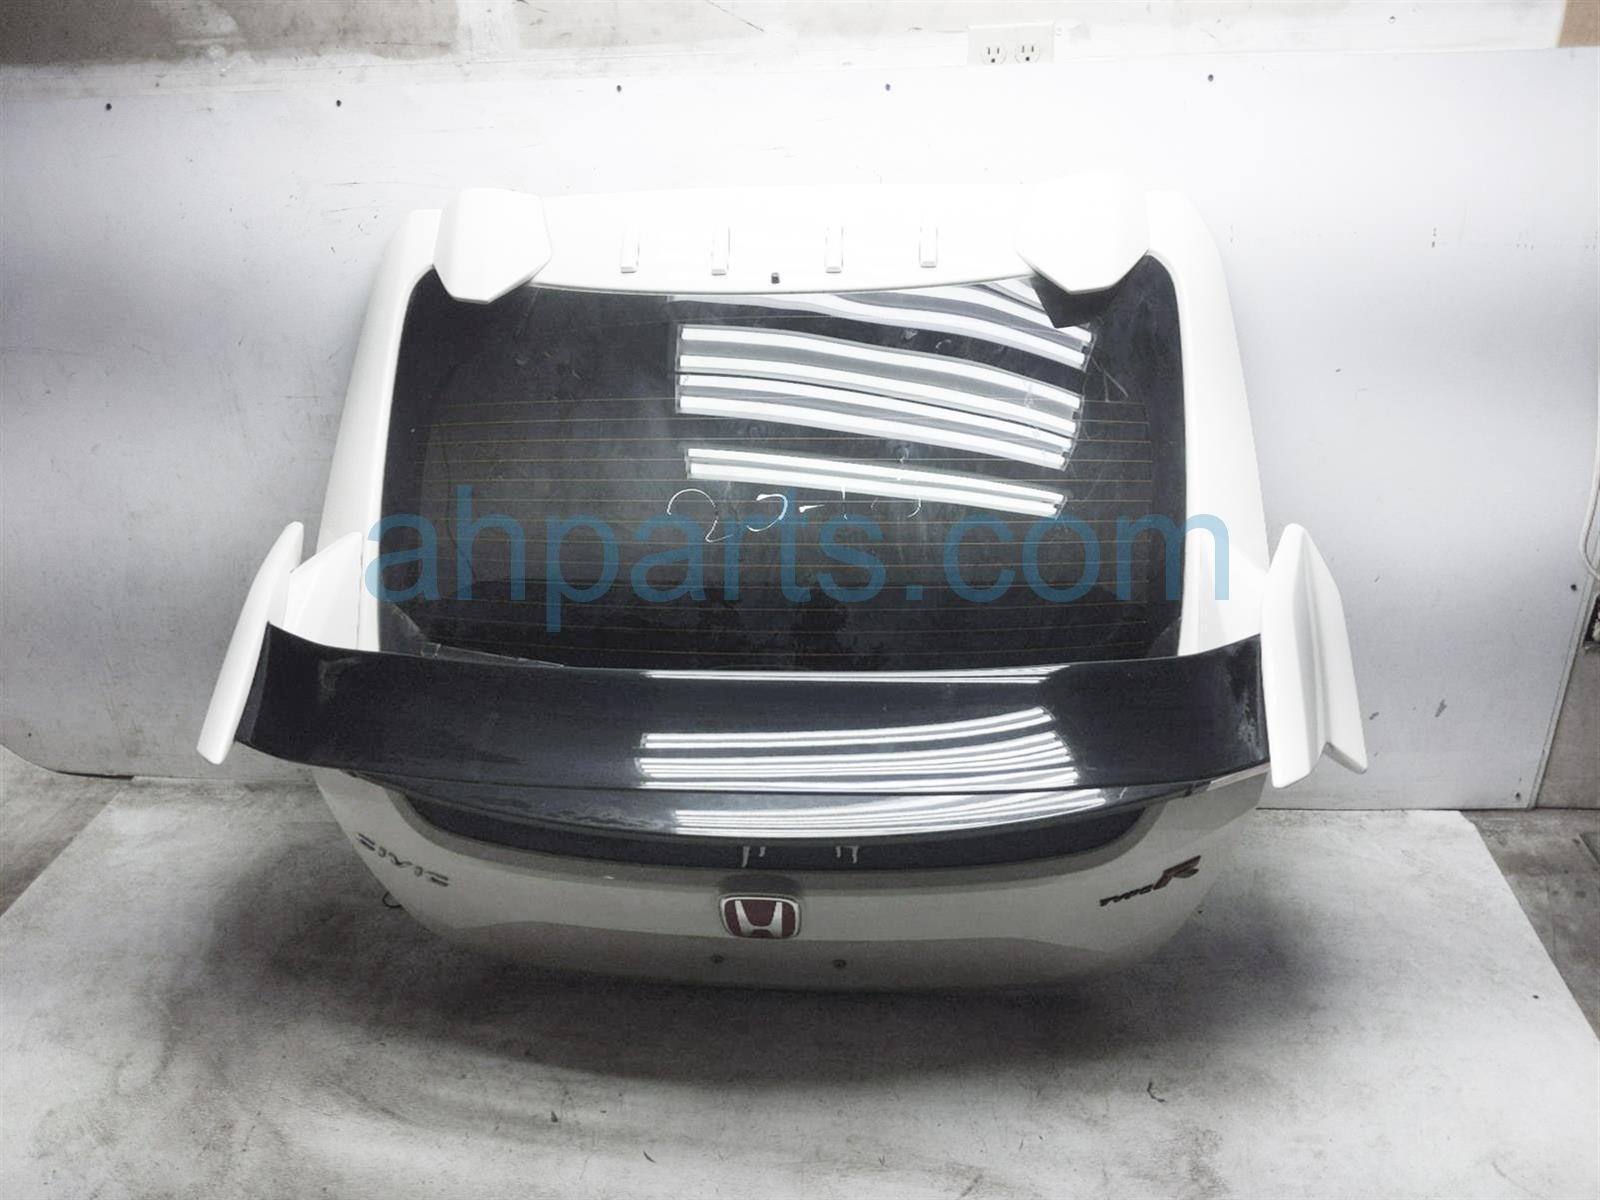 2018 Honda Civic Deck Lid/rear Trunk White Type R 68100 TGH A00ZZ Replacement